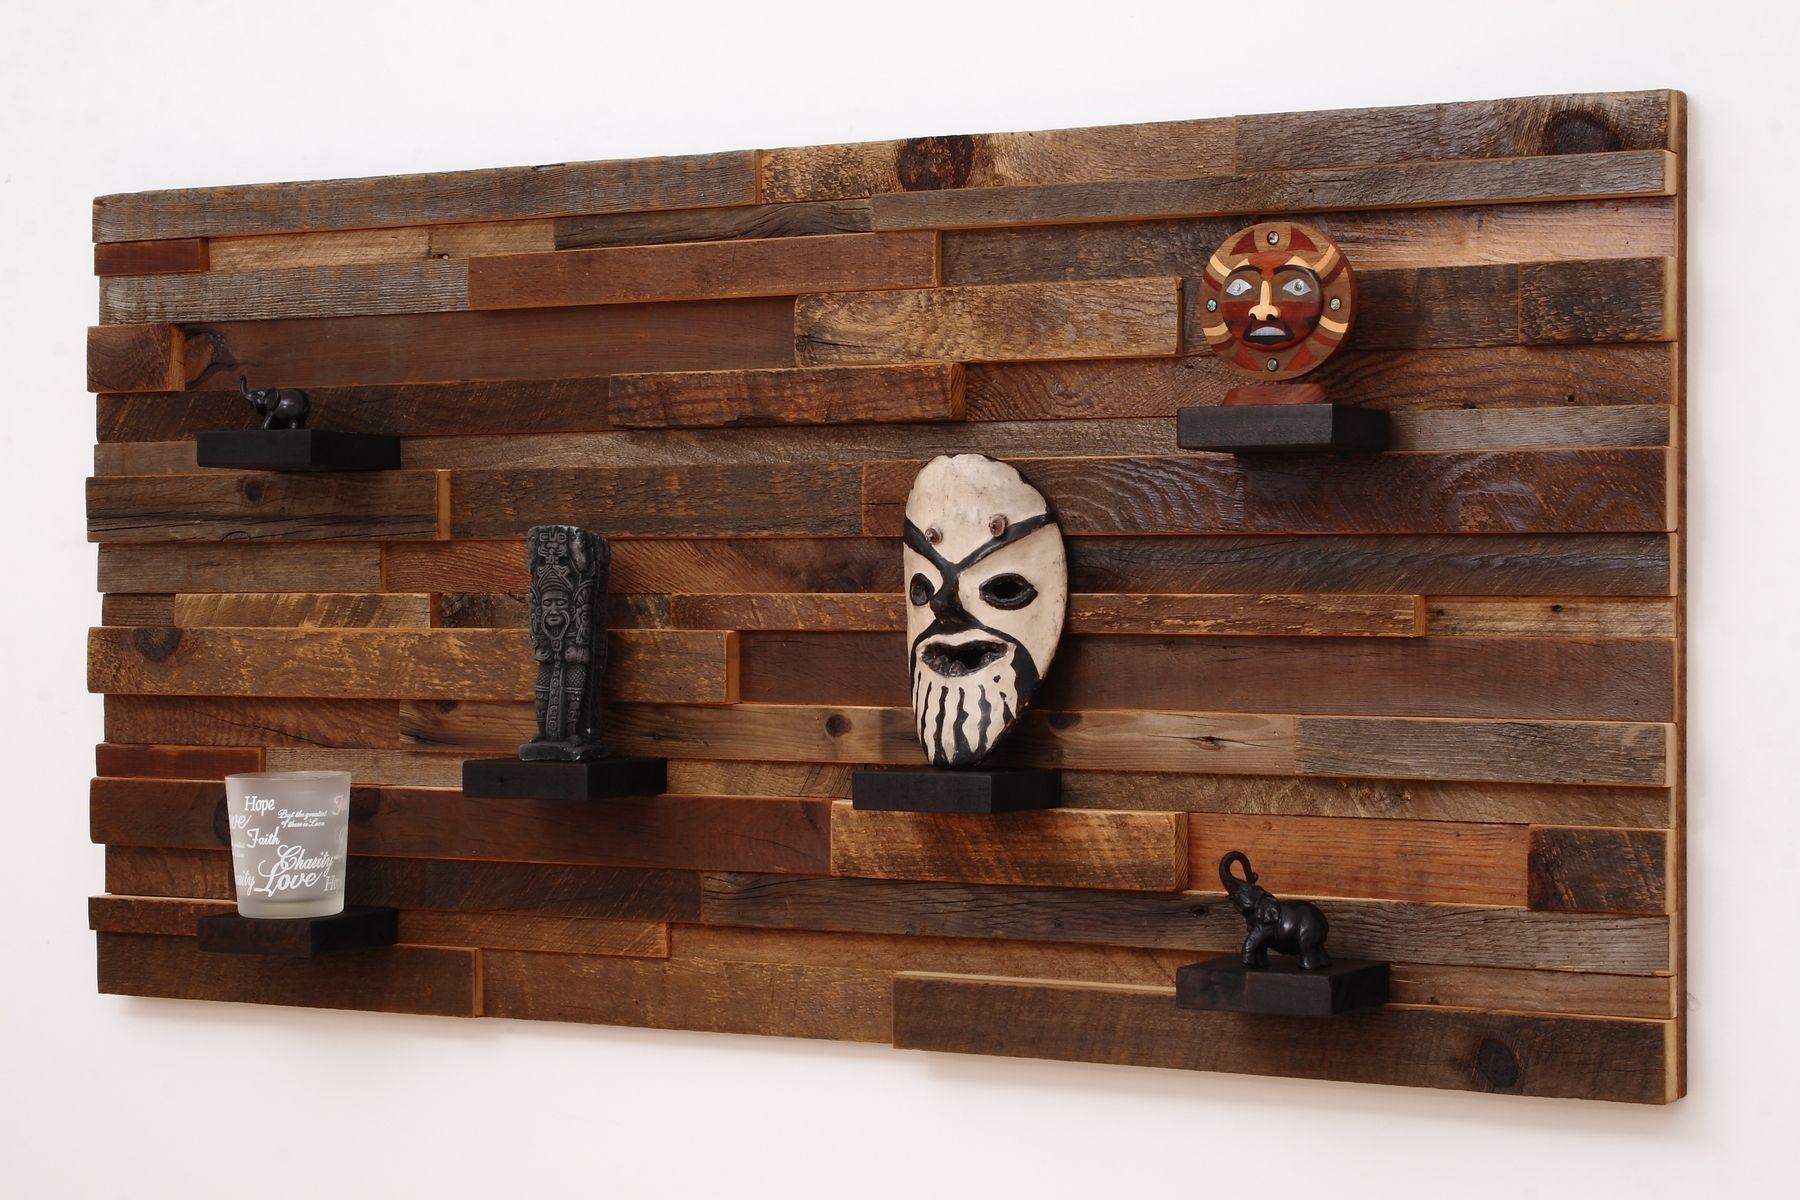 handmade wood wall art with wood shelves by carpentercraig